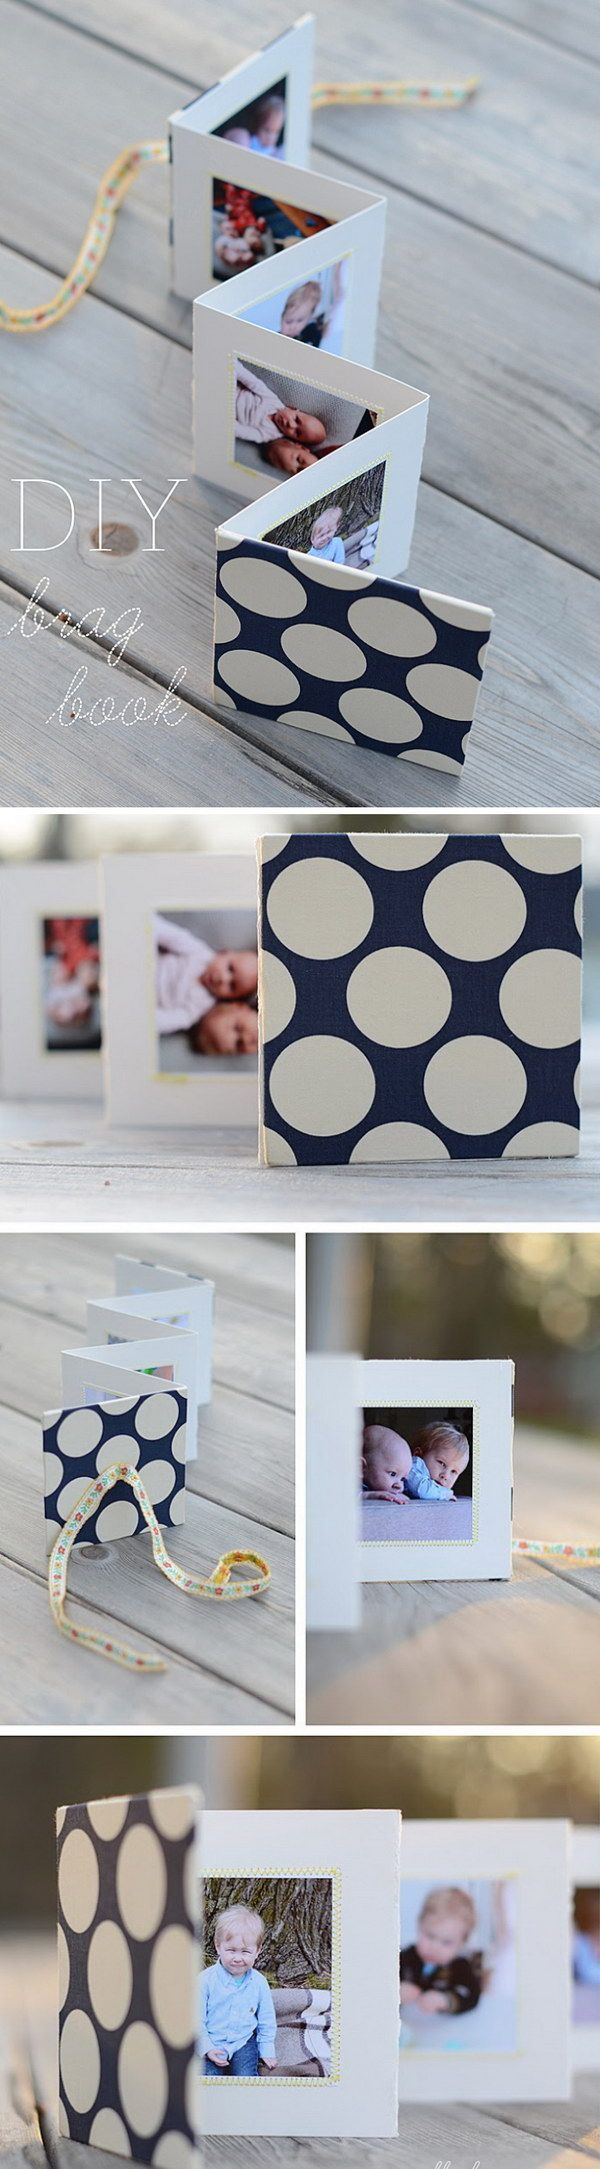 418 best diy gifts for moms images on pinterest bricolage craft